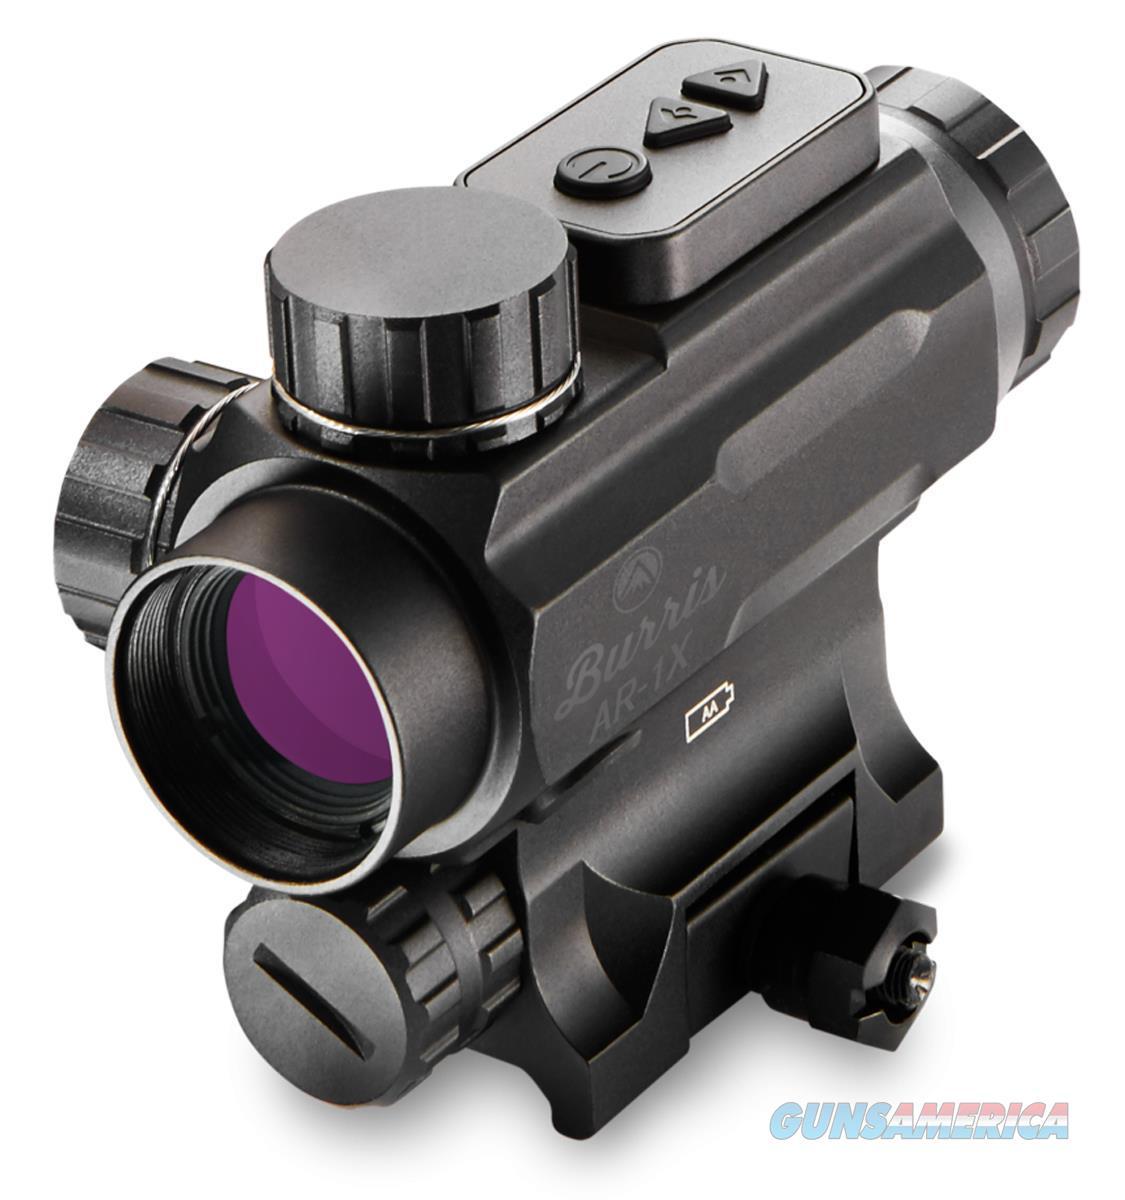 "Burris 300219 Ar-1X 1X 20Mm Obj 2.7"" Eye Relief  Black Matte 300219  Non-Guns > Scopes/Mounts/Rings & Optics > Rifle Scopes > Variable Focal Length"